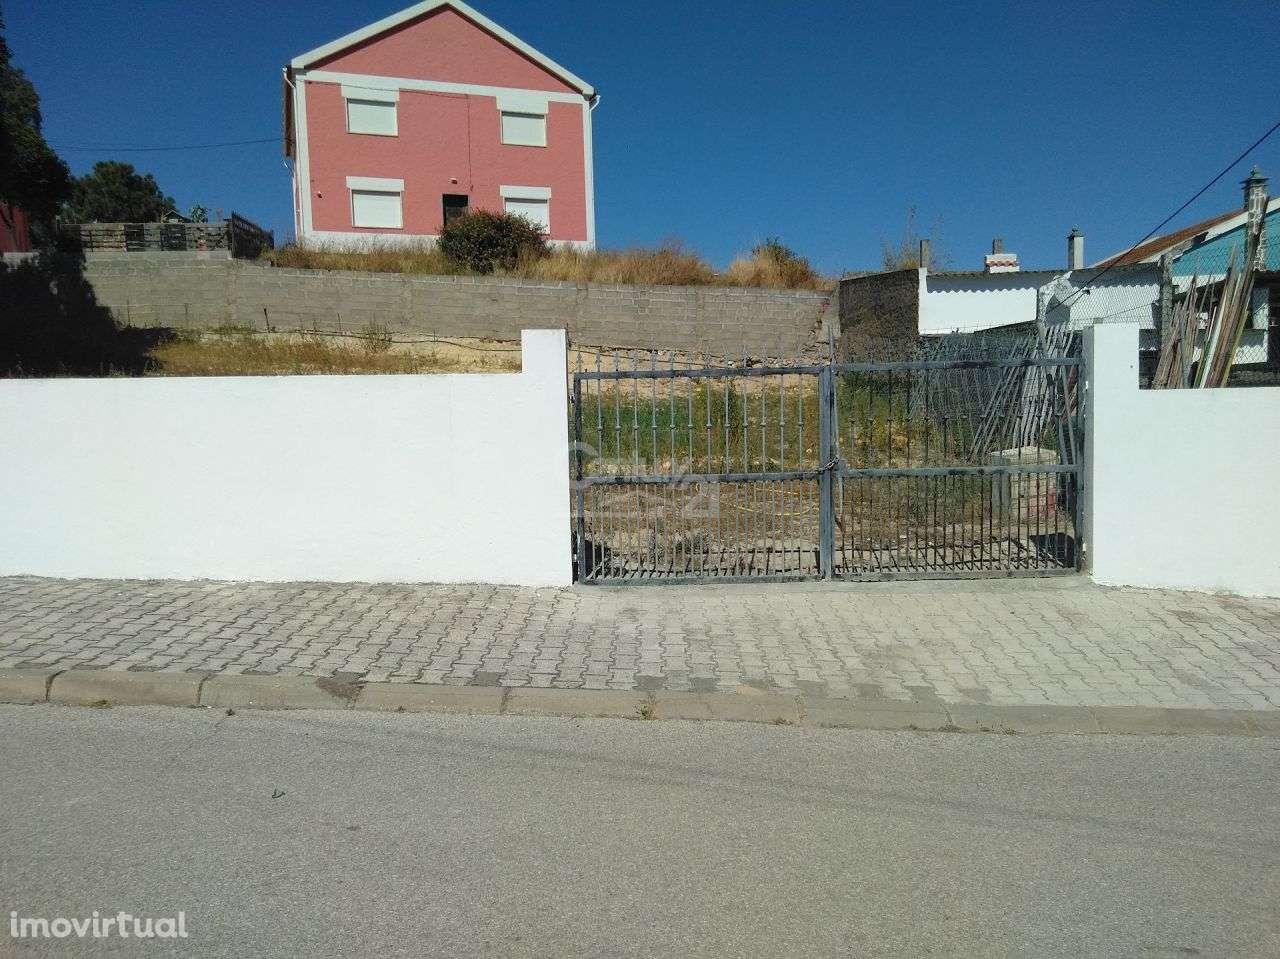 Terreno para comprar, Seixal, Arrentela e Aldeia de Paio Pires, Seixal, Setúbal - Foto 4